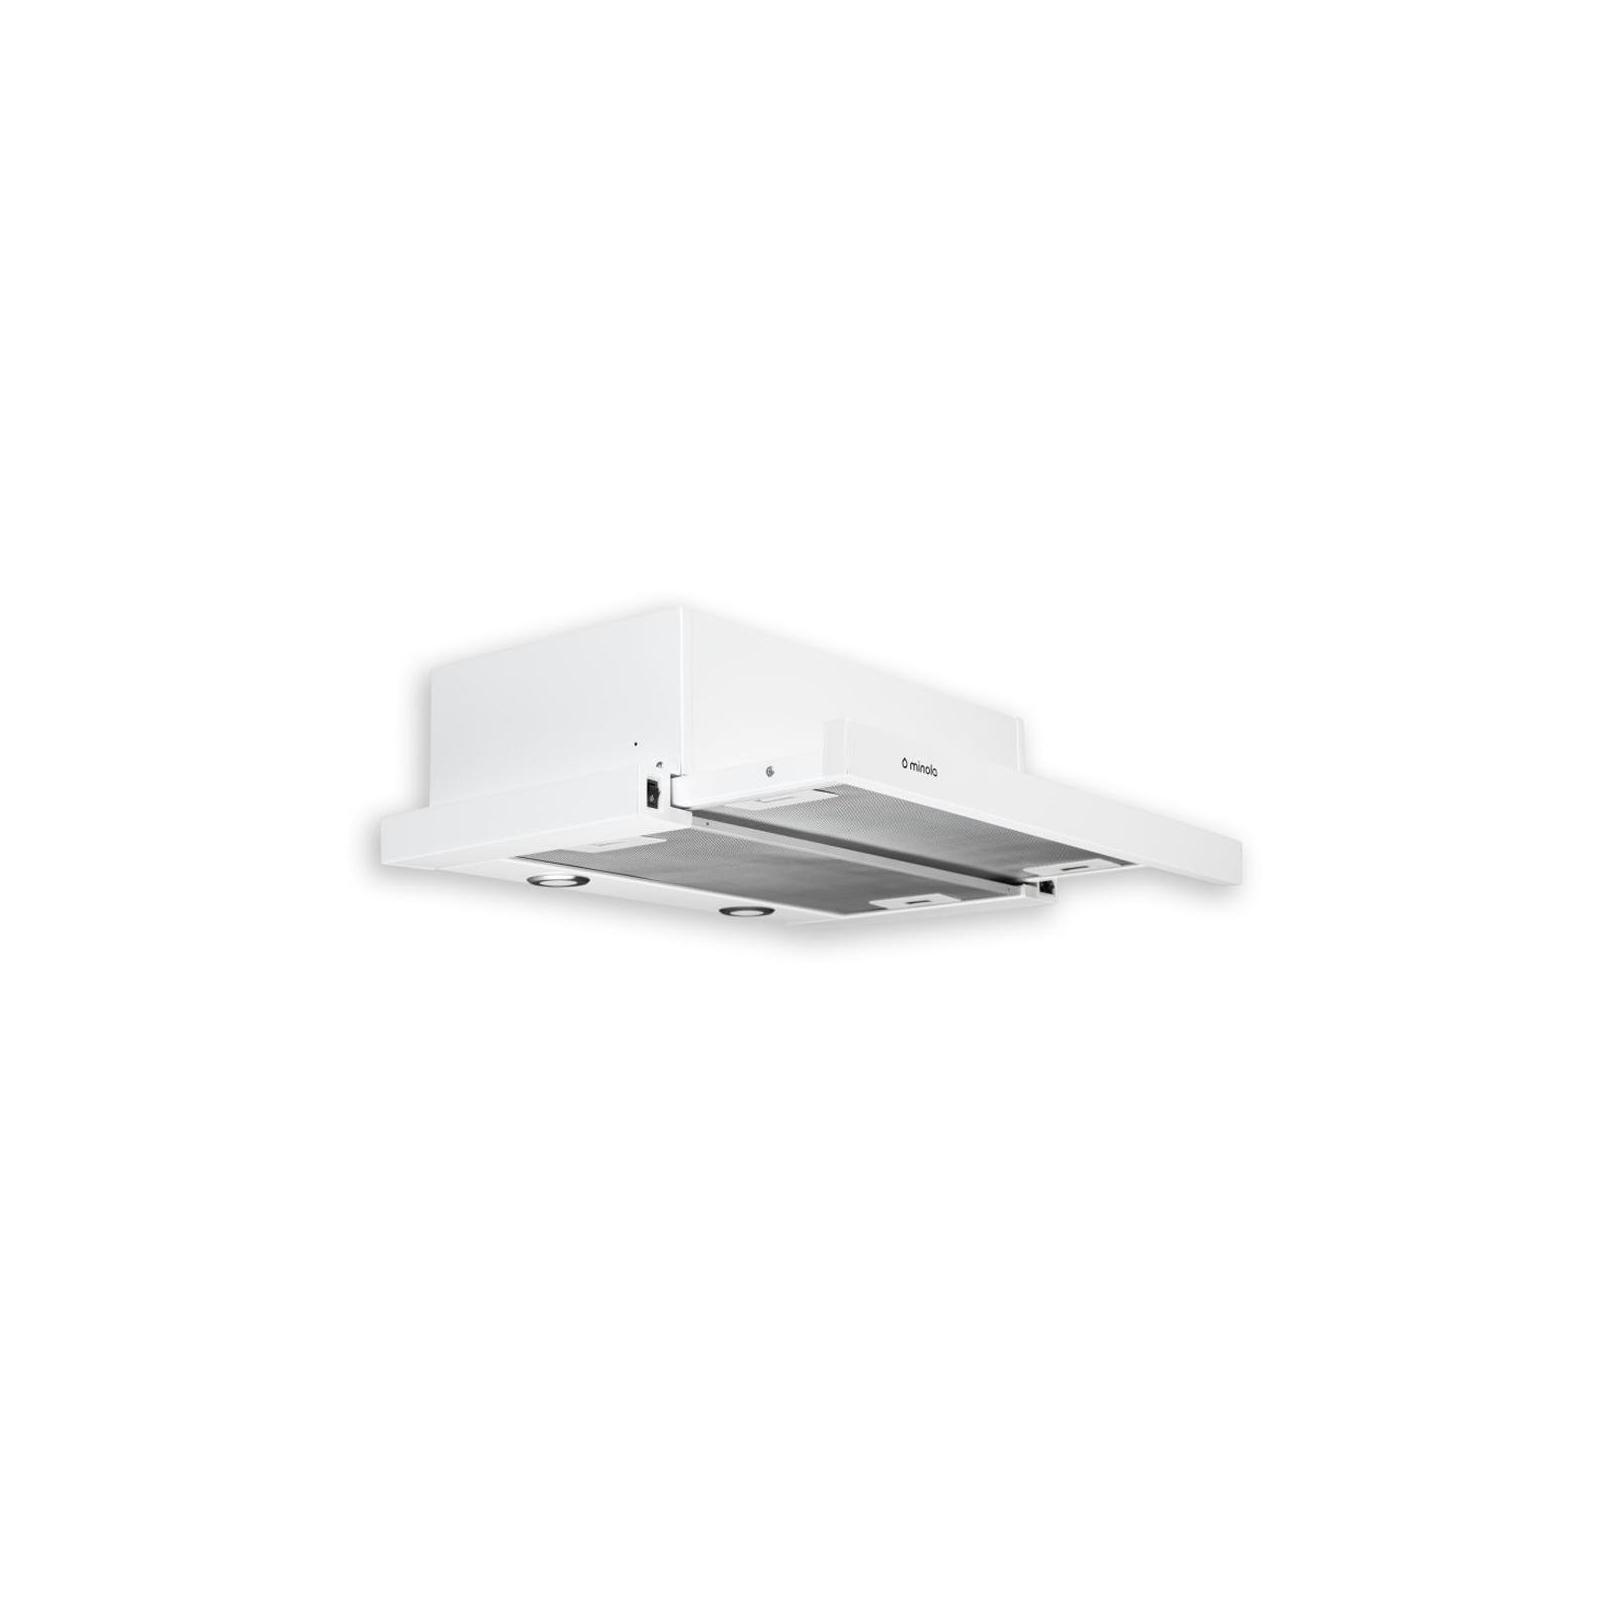 Вытяжка кухонная MINOLA HTL 6112 WH 650 LED